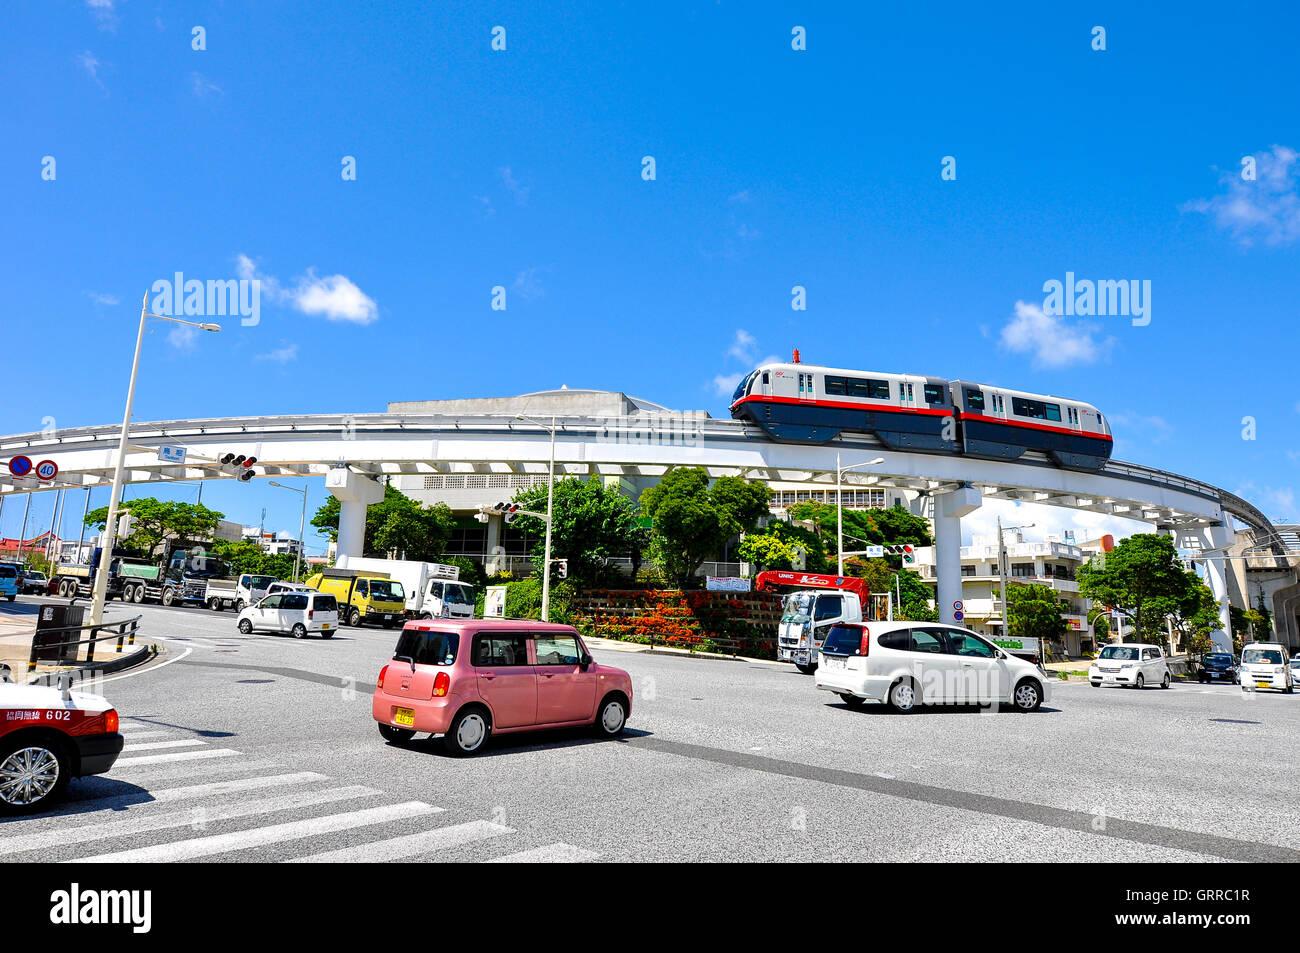 Okinawa Monorail (Yui-Rail) is an only rail transport in Naha City, Okinawa, Japan. Taken in Shuri area, July 22, - Stock Image